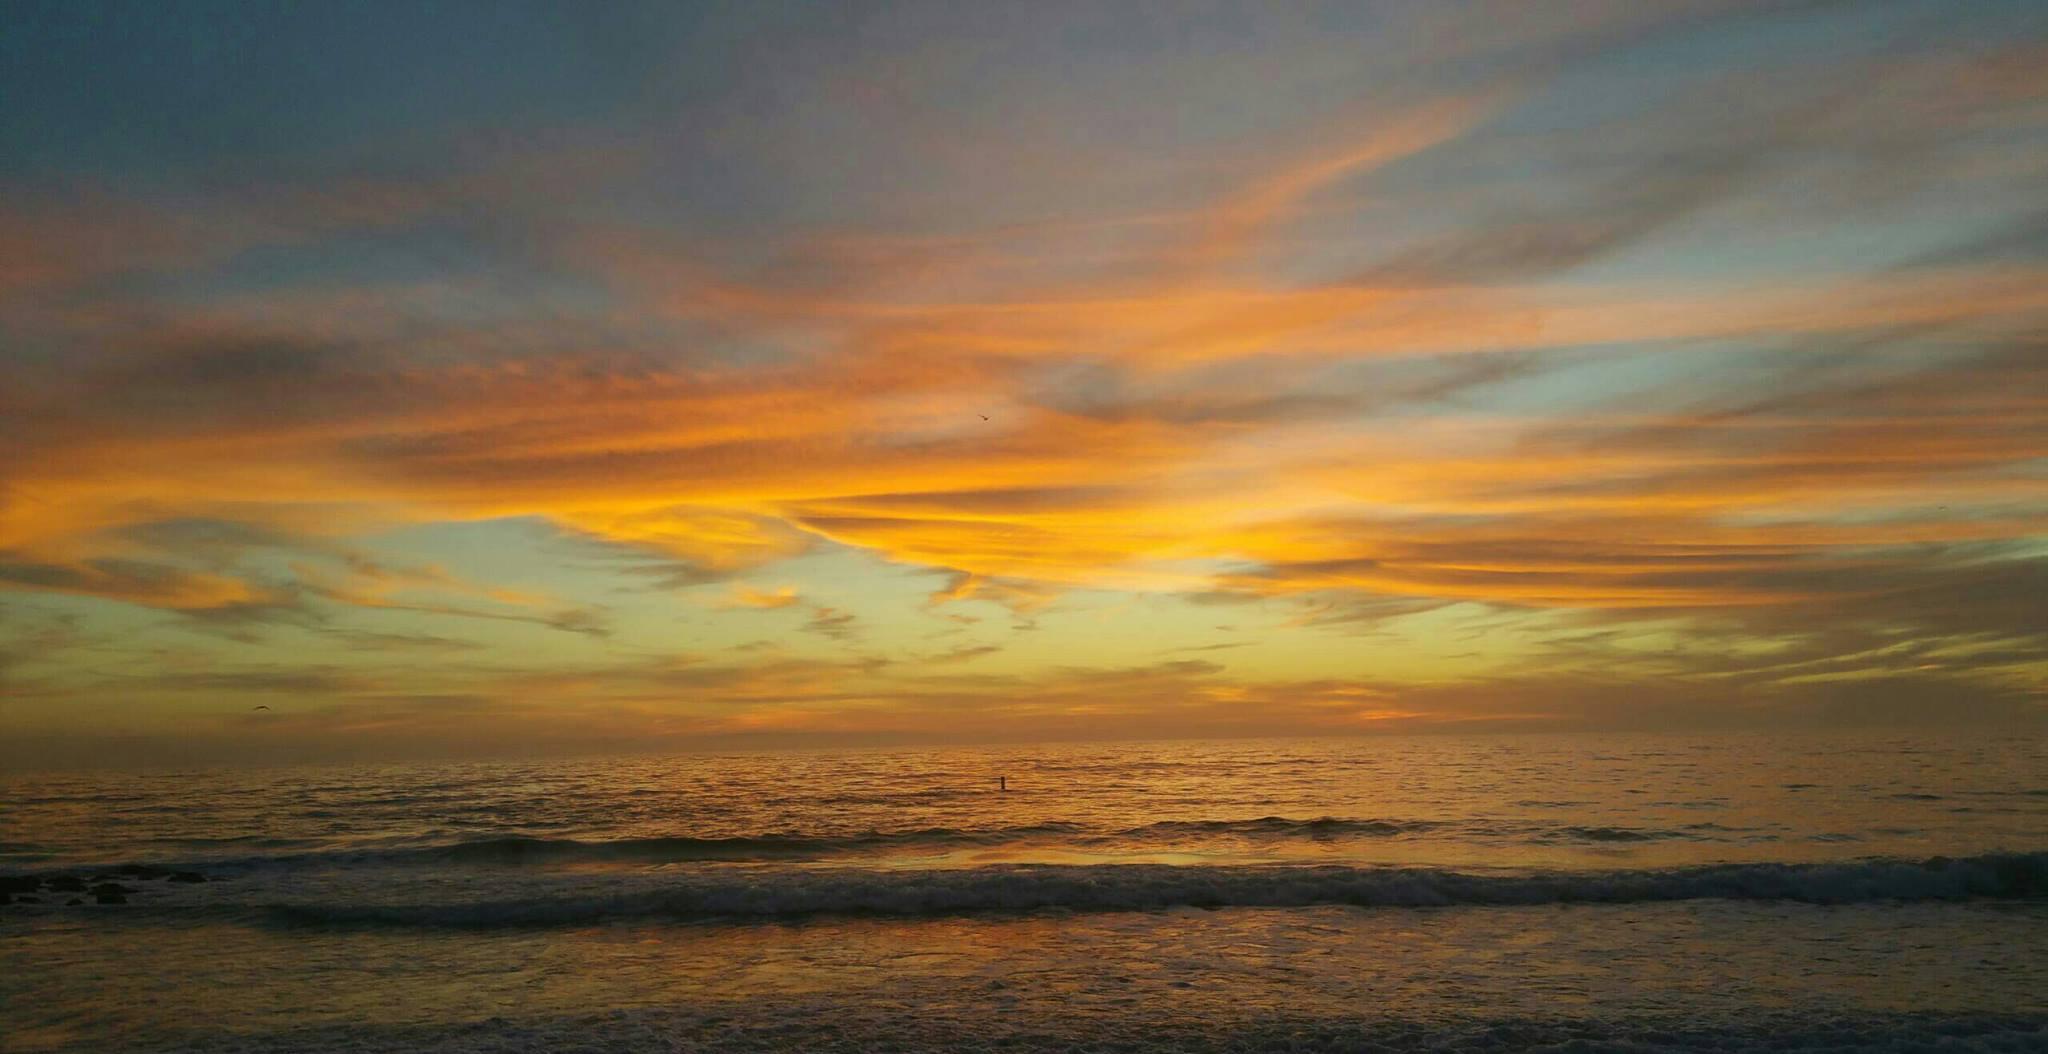 Photo taken by Amanda Burg, Anna Maria Island